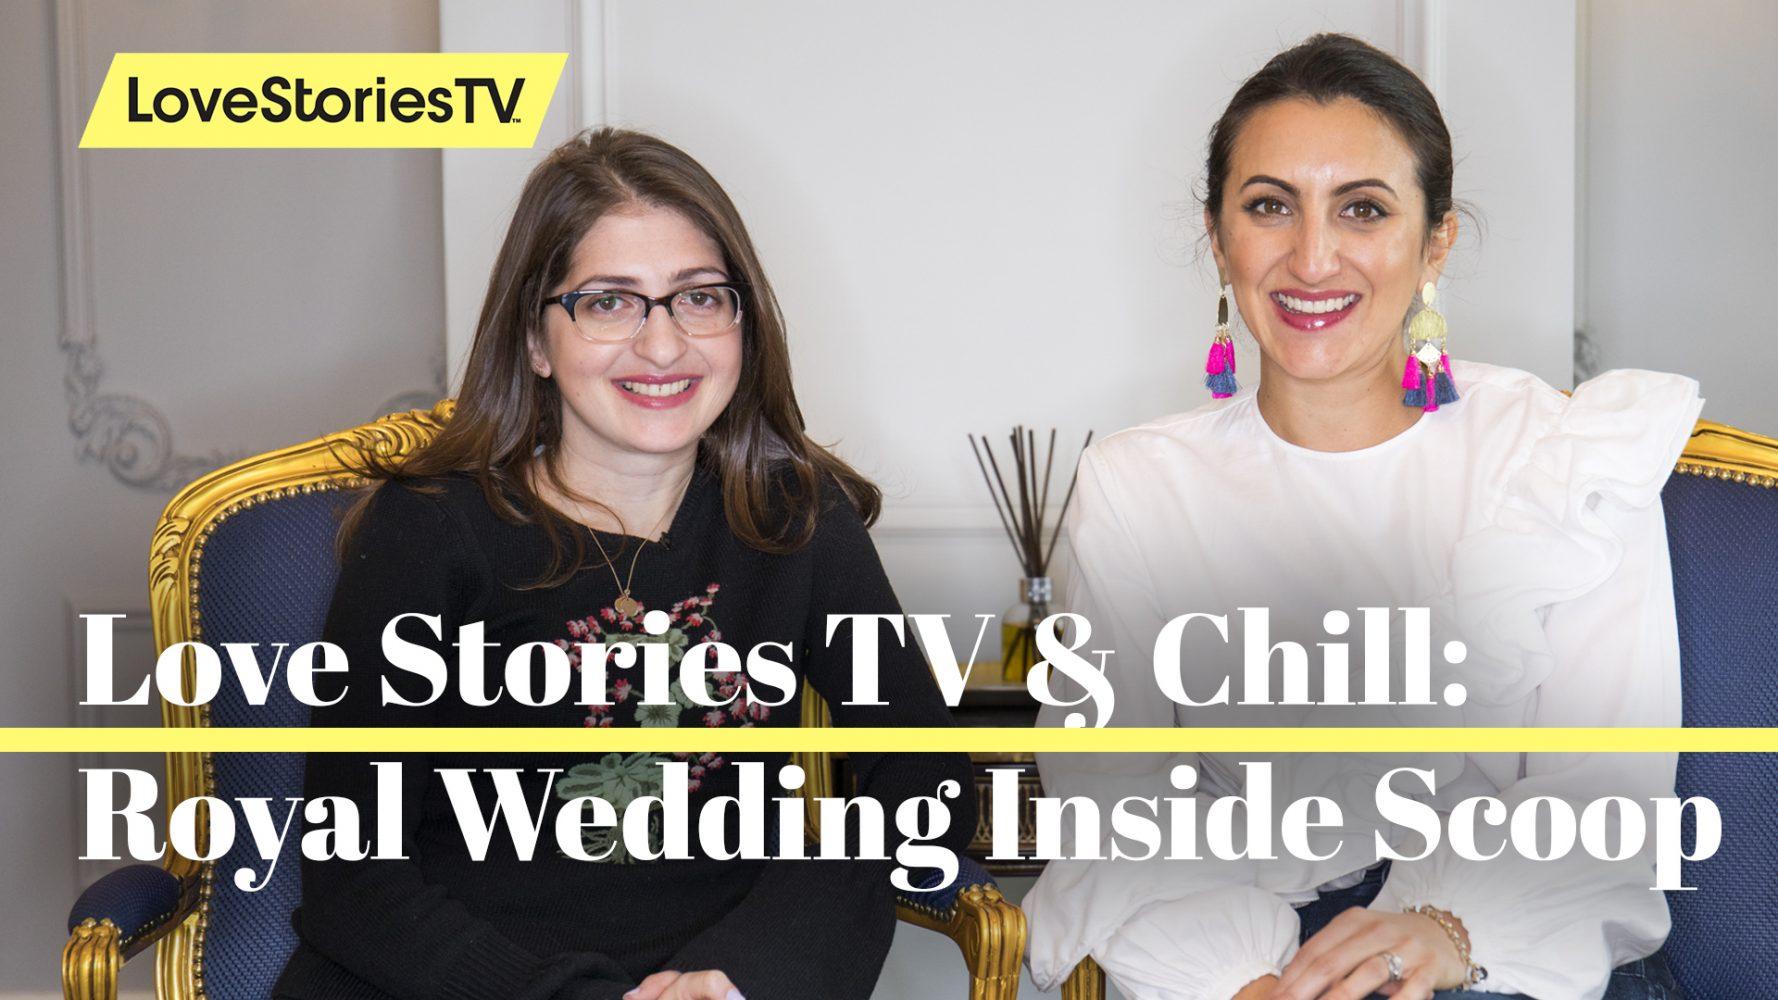 #LoveStoriesTVandChill Episode 19: Royal Wedding Inside Scoop With WeddingWire